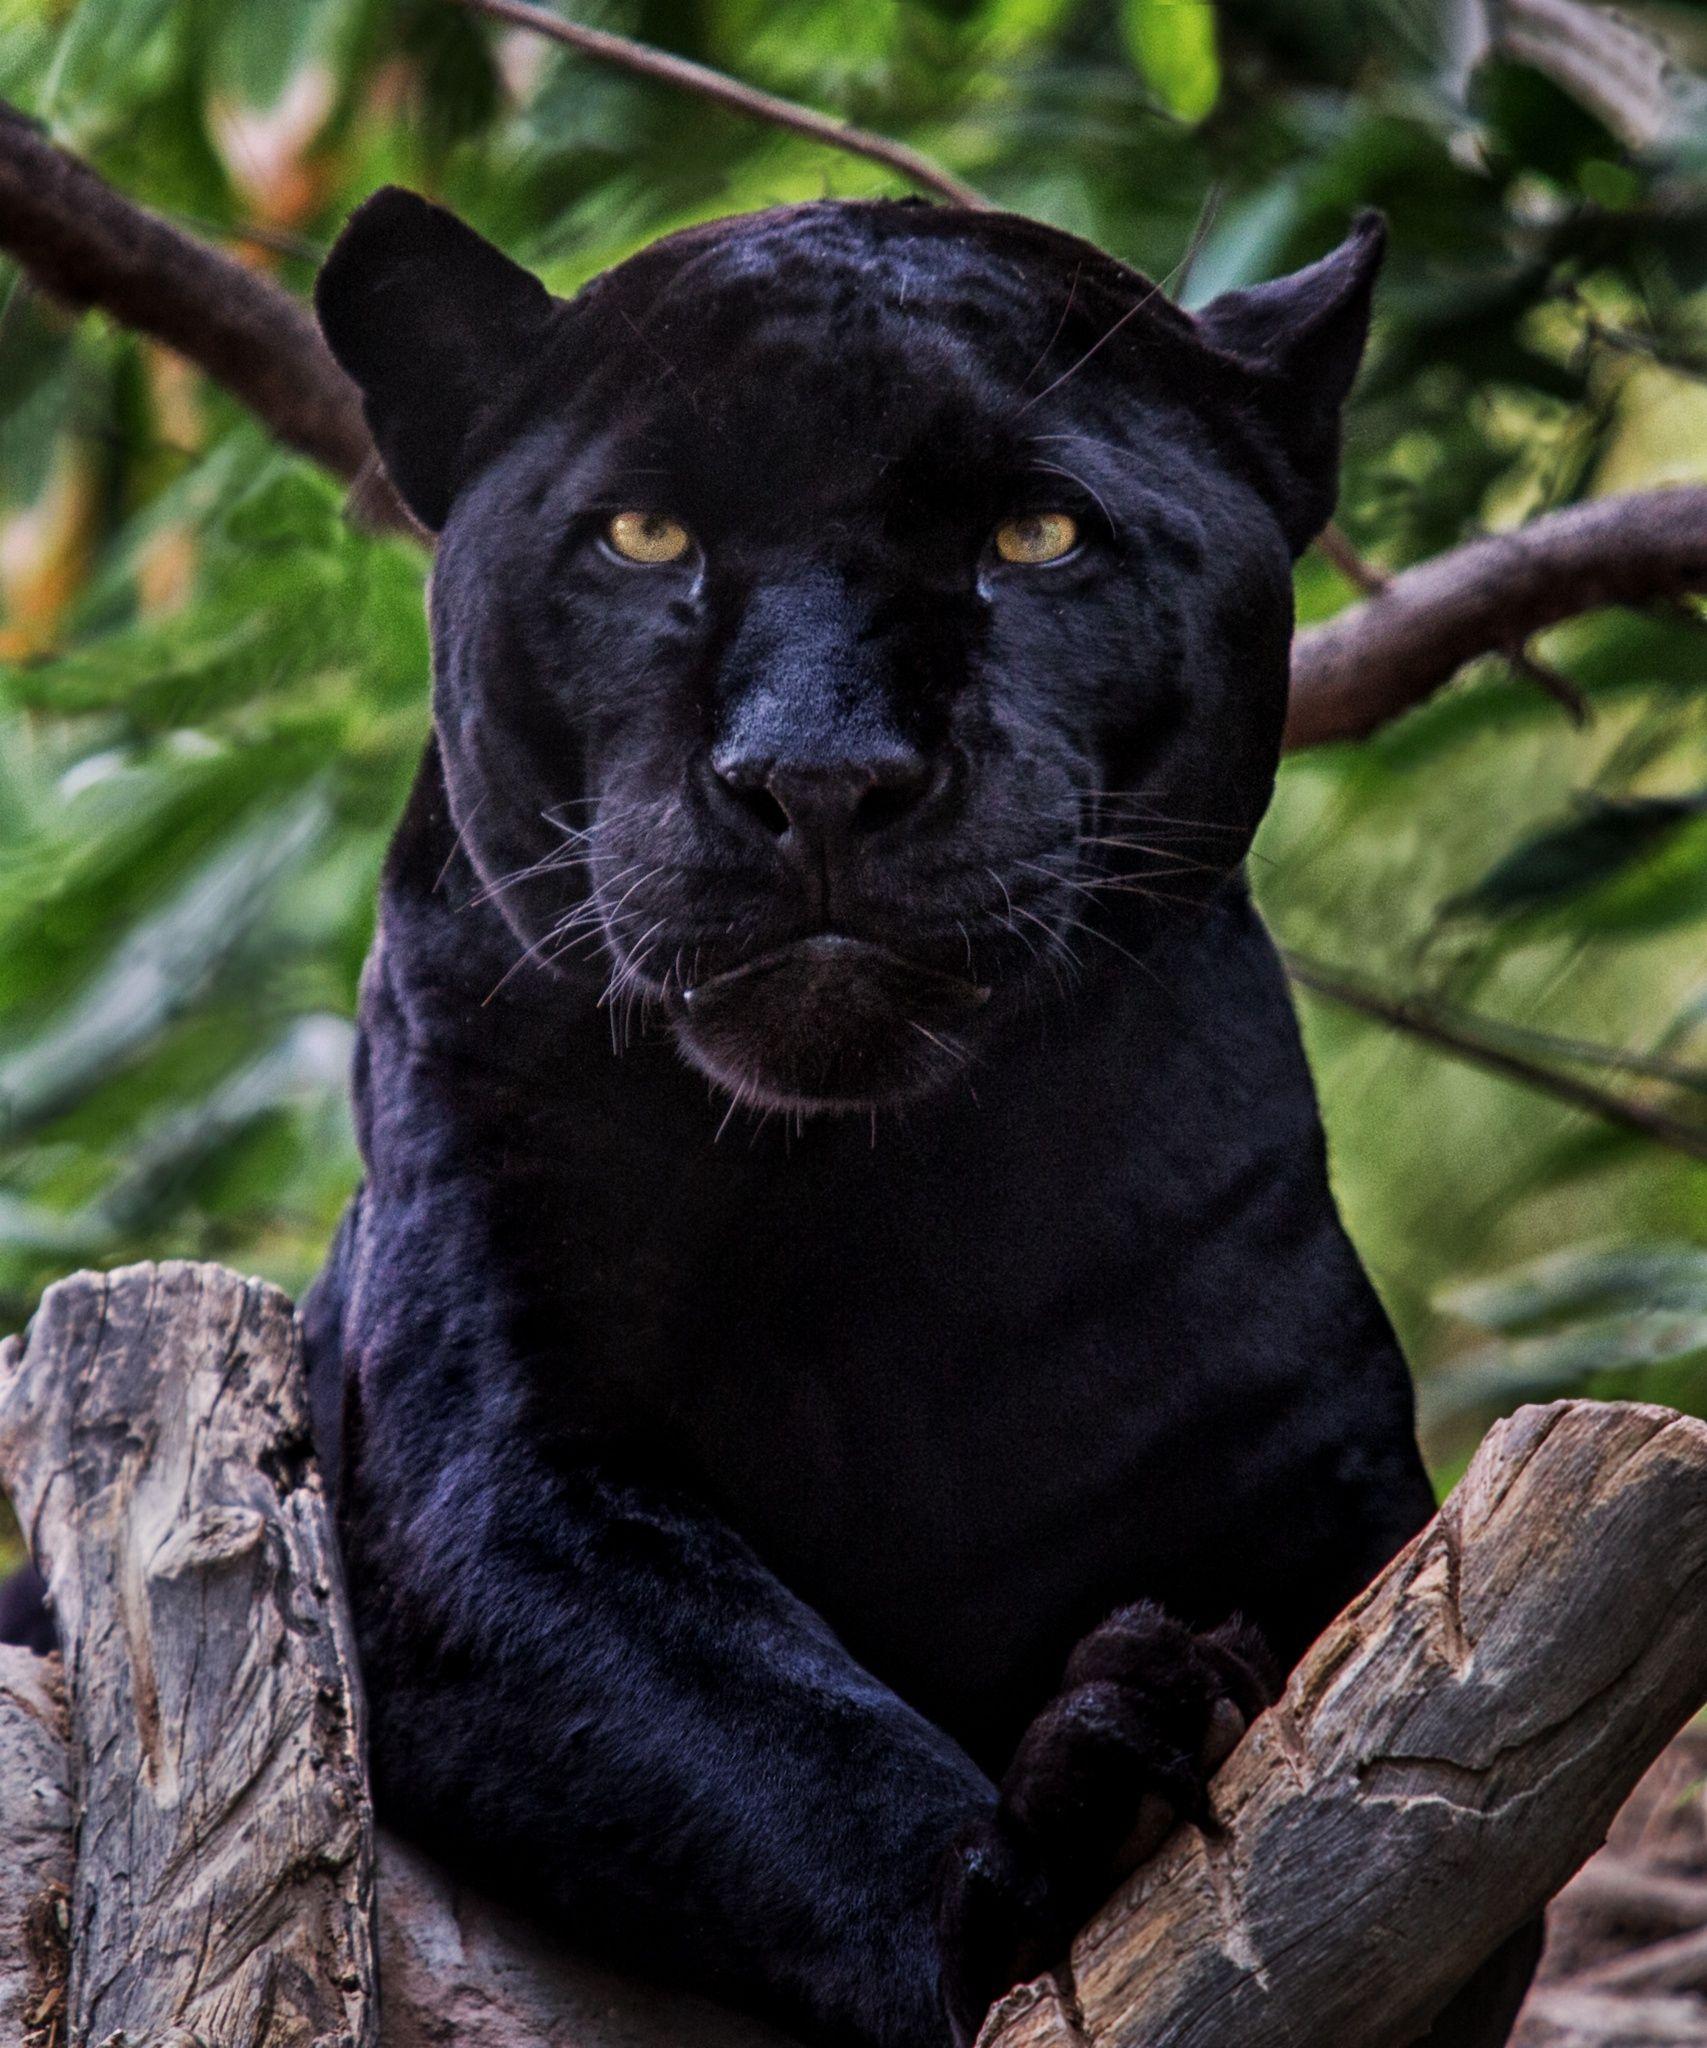 Black Jaguar Growling: Black Jaguar - Female Black Jaguar In A Tree.